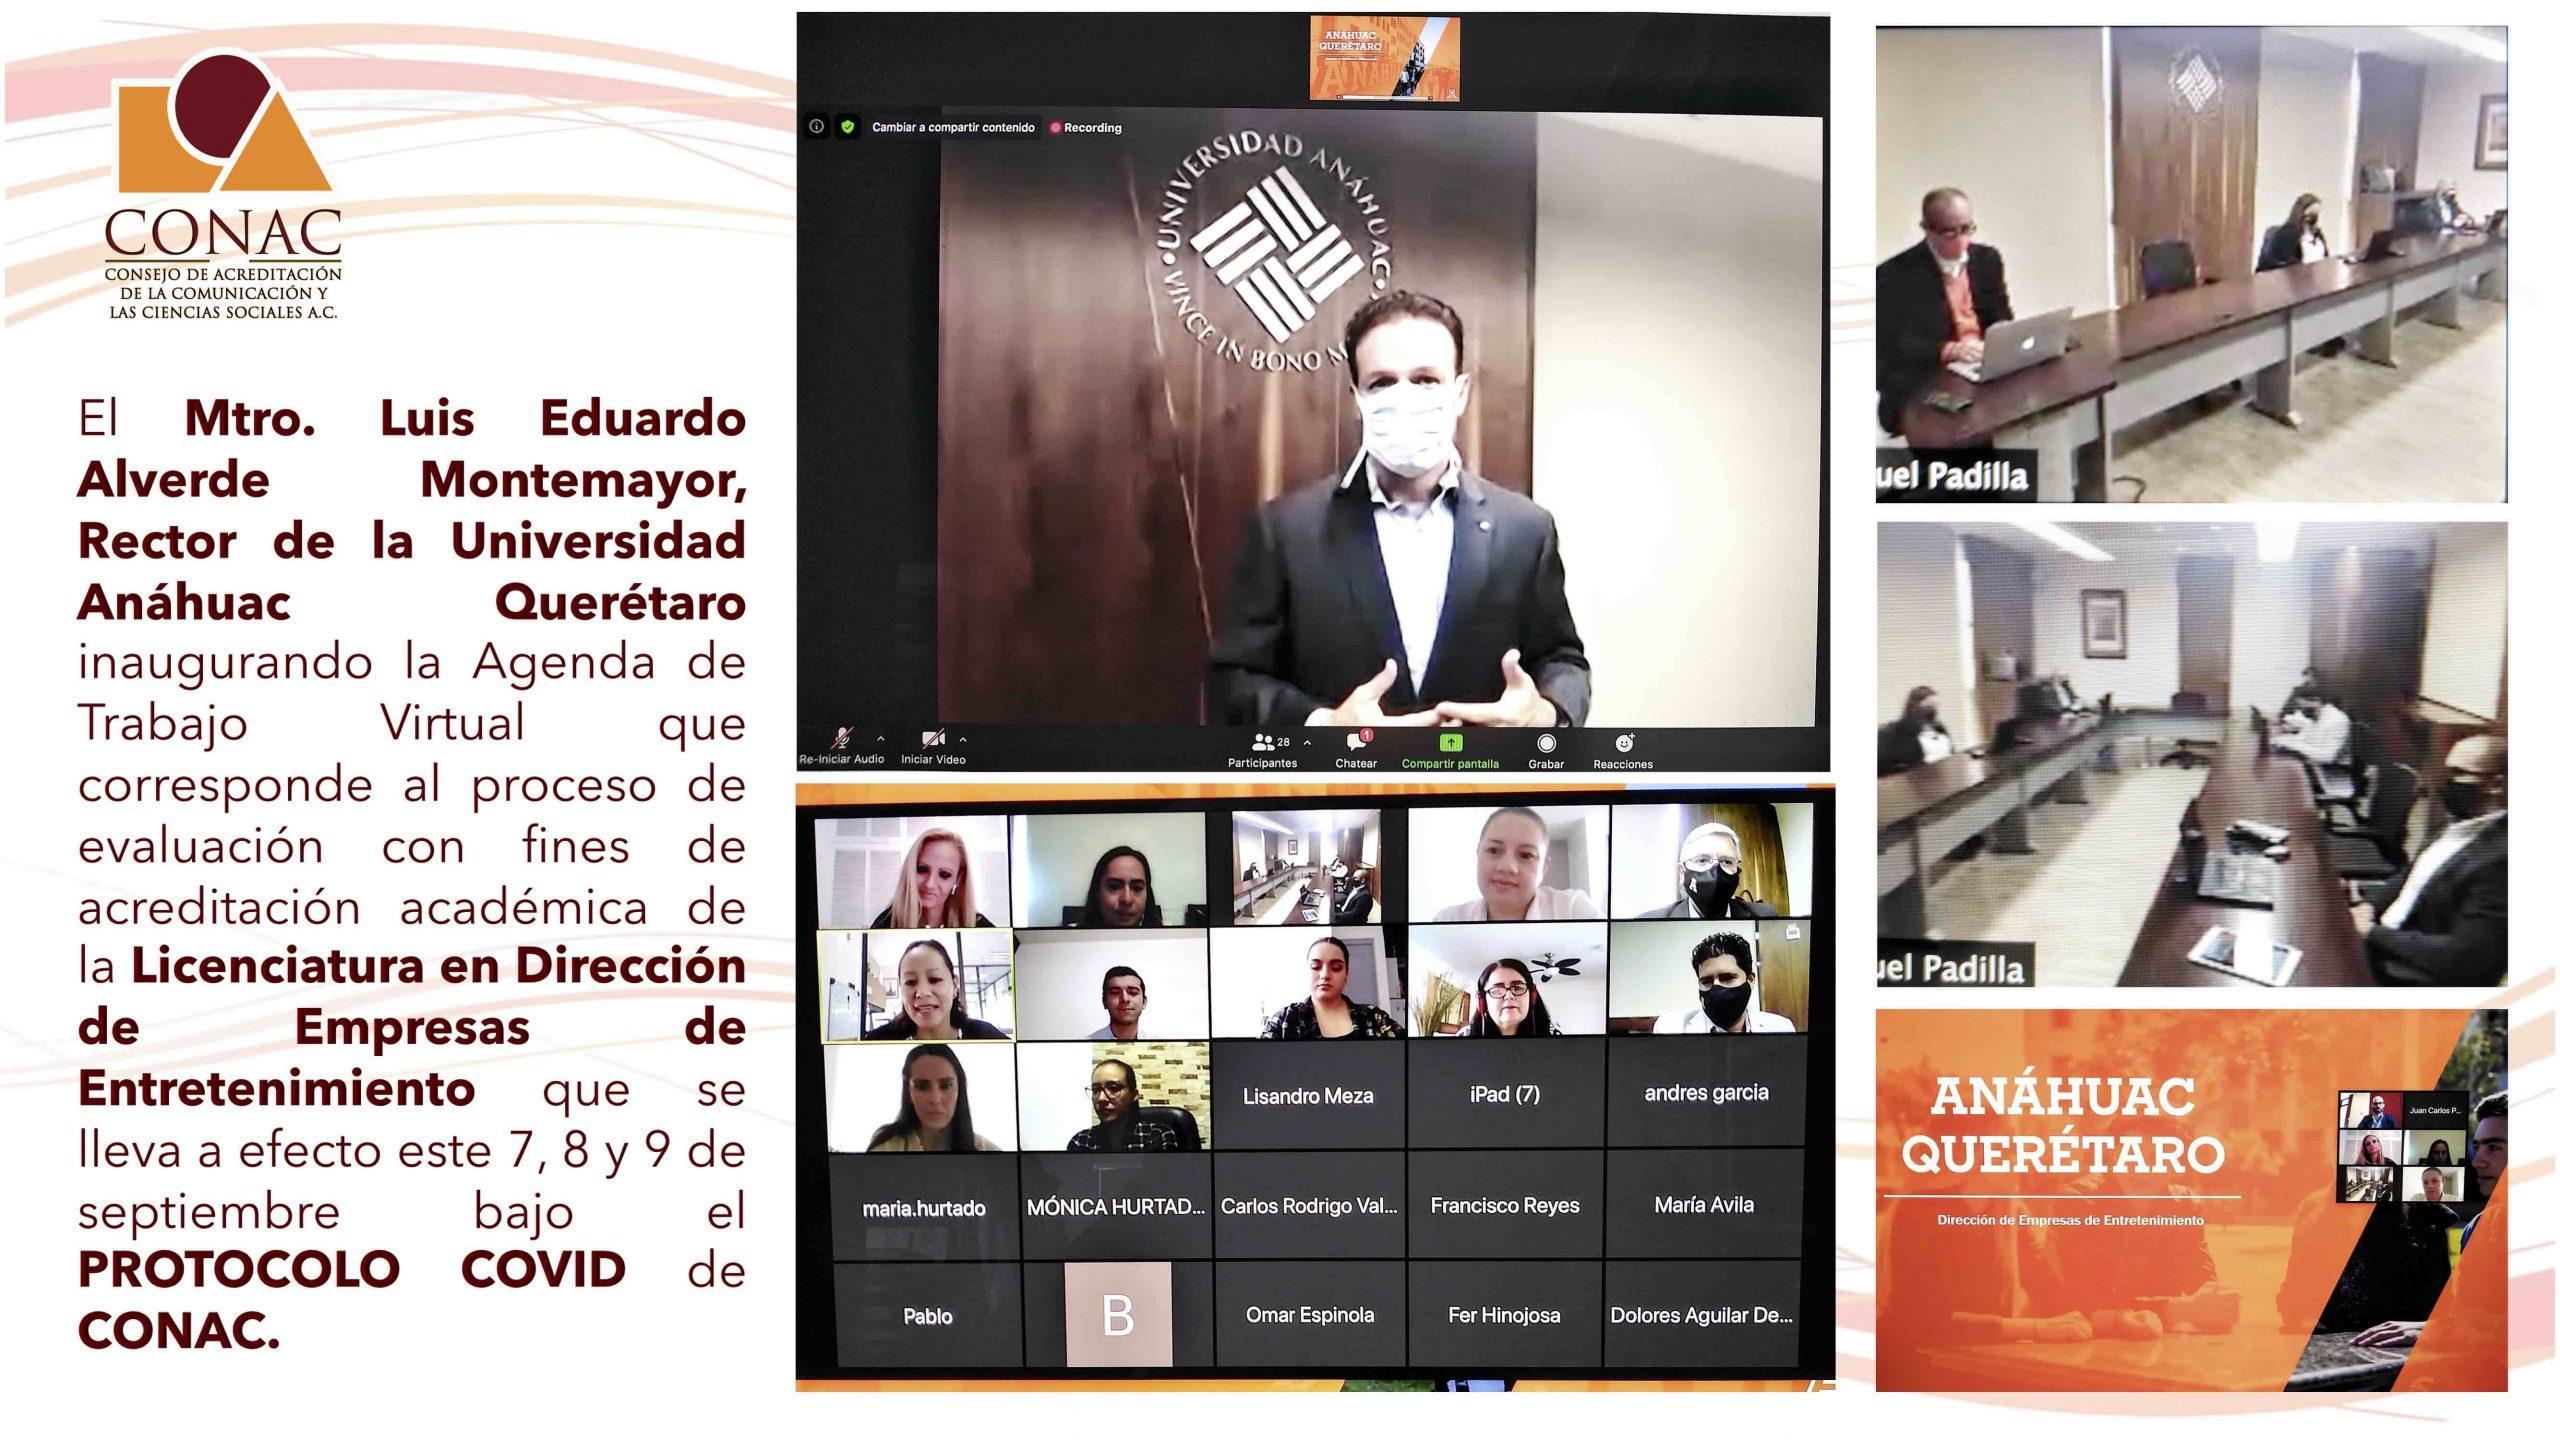 Sesión Inaugural Rector Universidad Anáhuac Querétaro